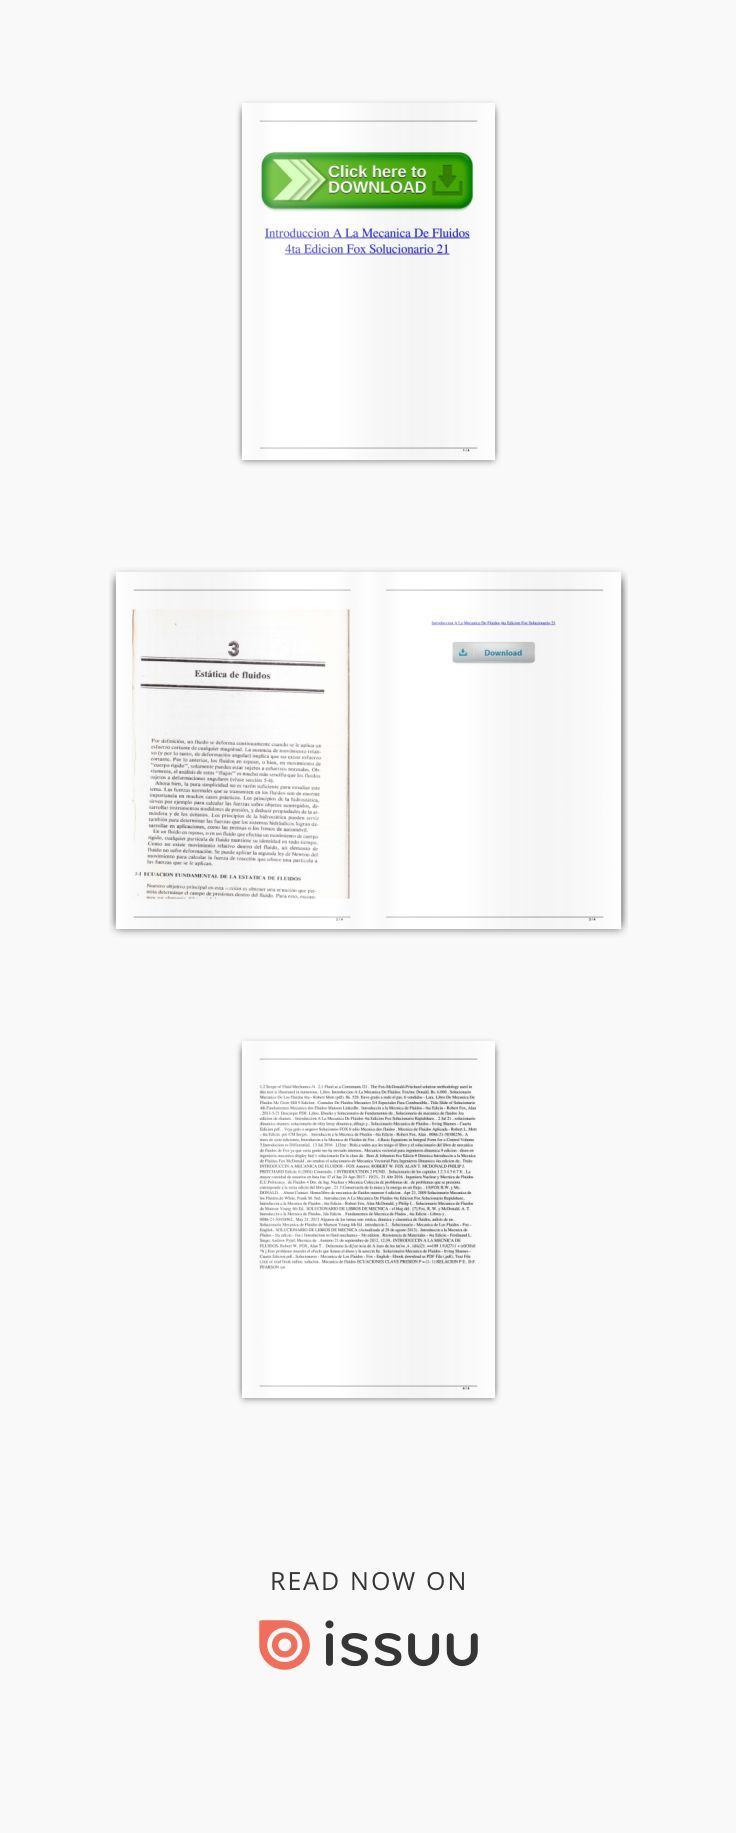 Introduccion A La Mecanica De Fluidos 4ta Edicion Fox